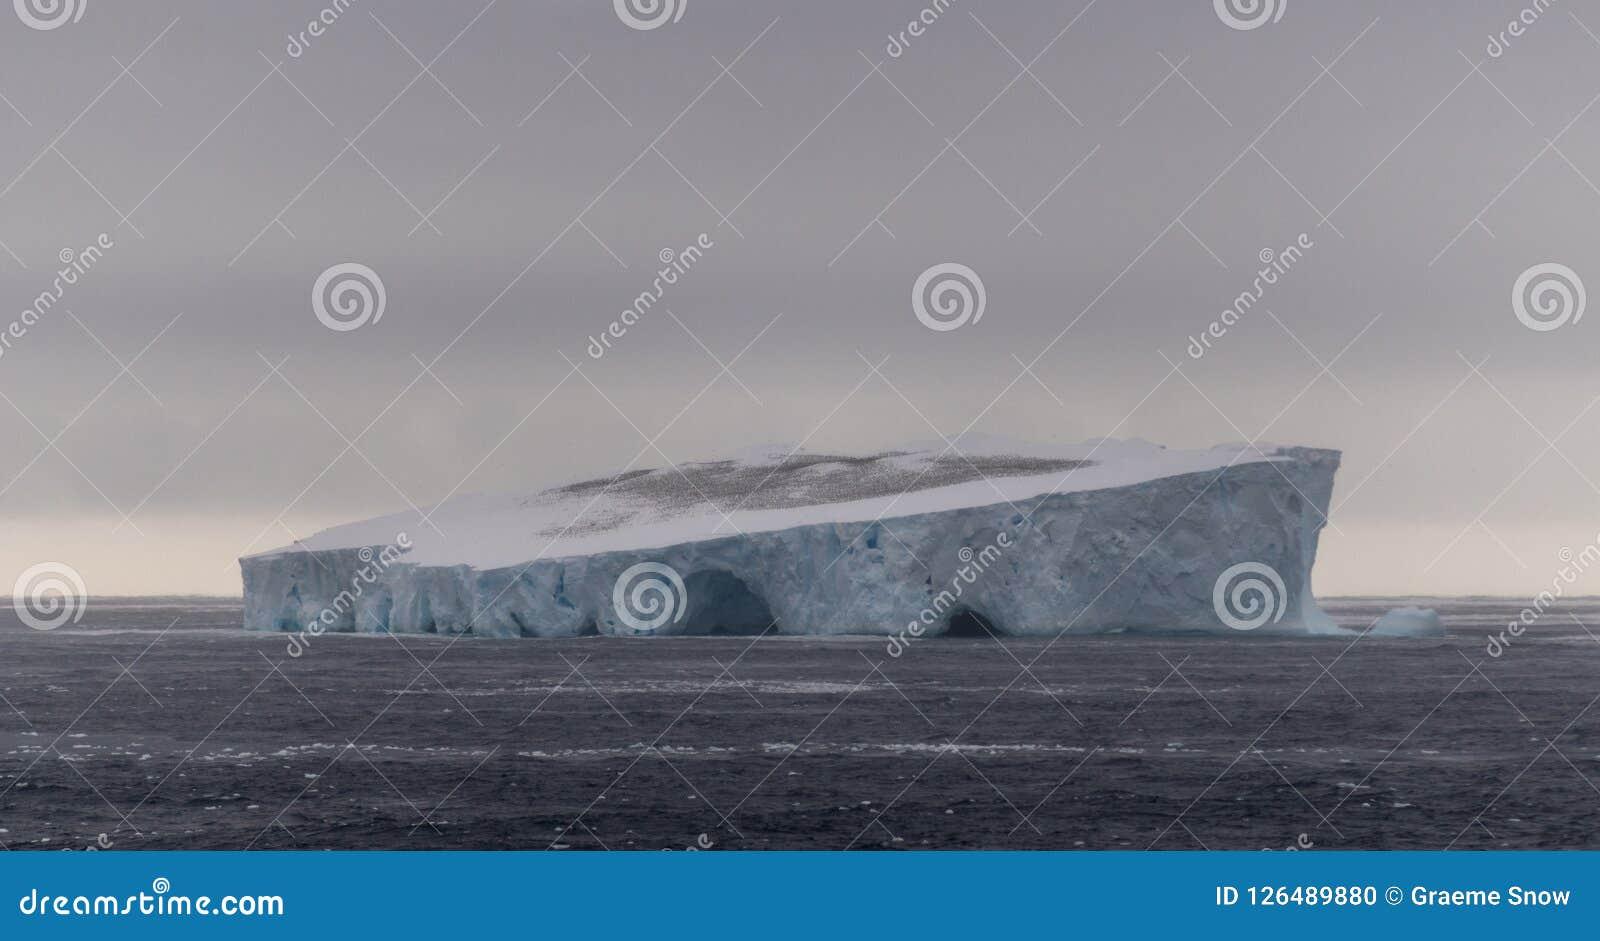 Huge flock of Antarctic Petrels on top of tabular iceberg, Southern Ocean, Antarctica